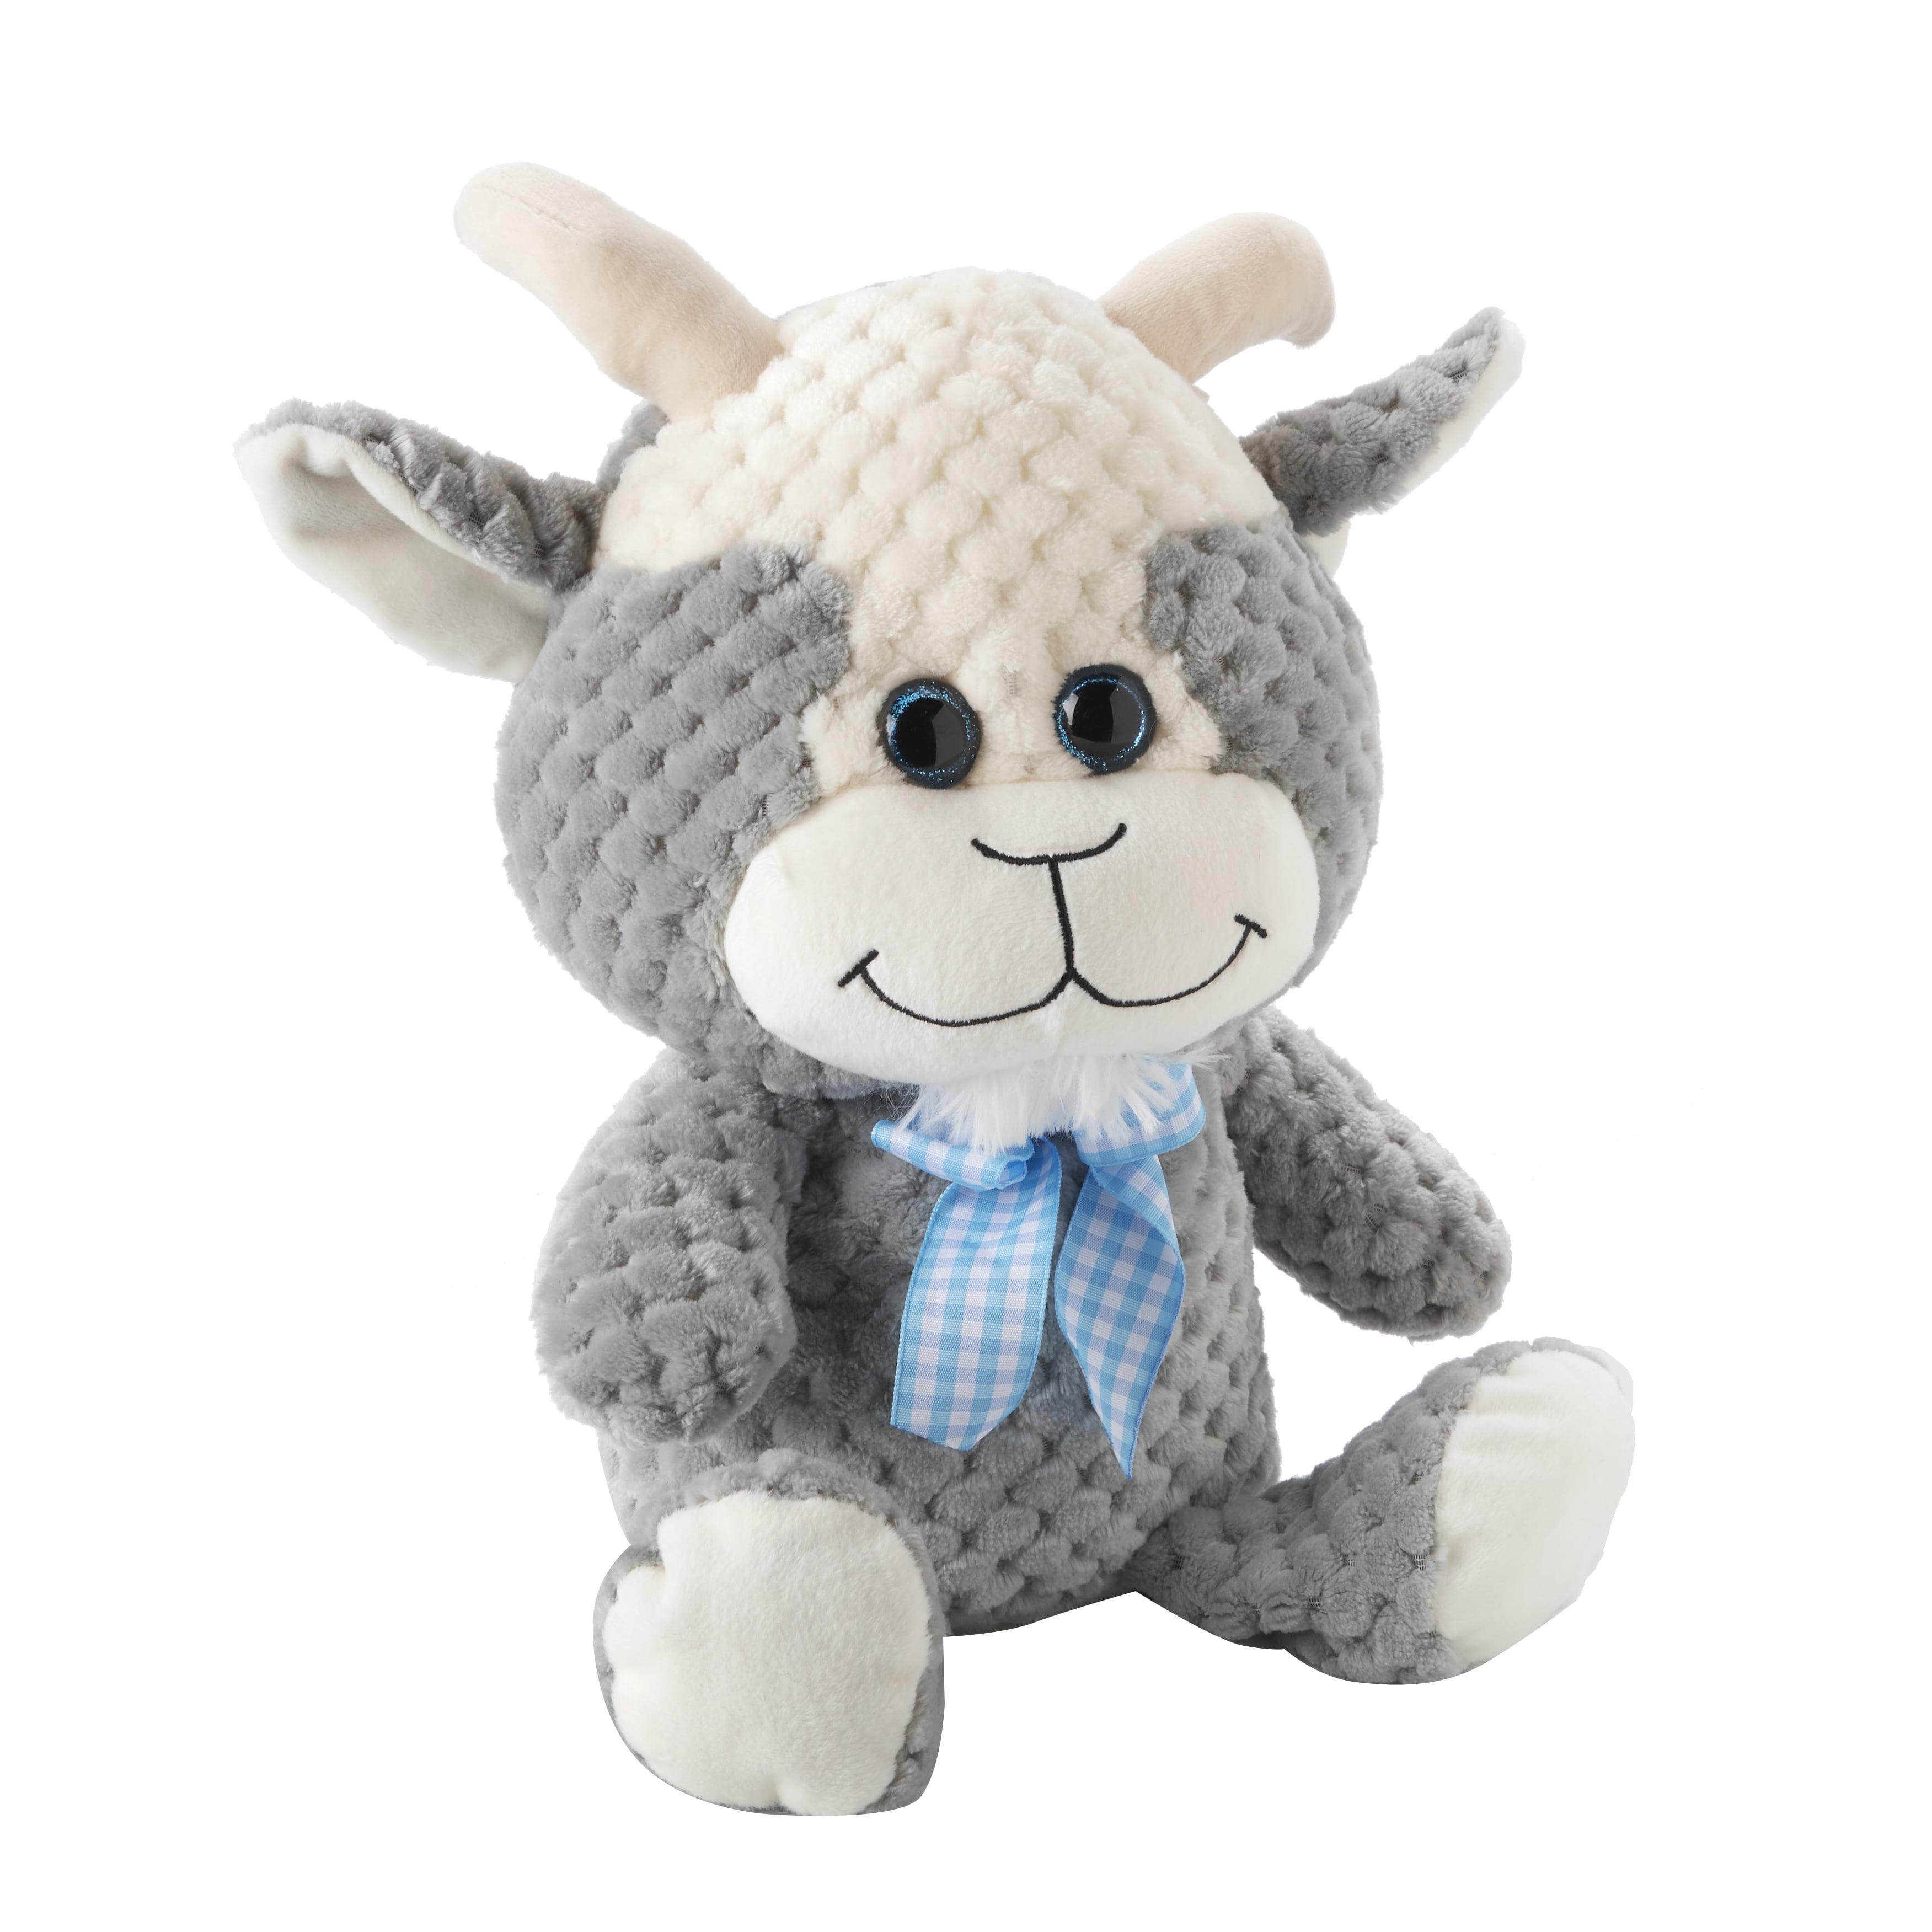 Way To Celebrate Easter Big-Head Plush, Goat